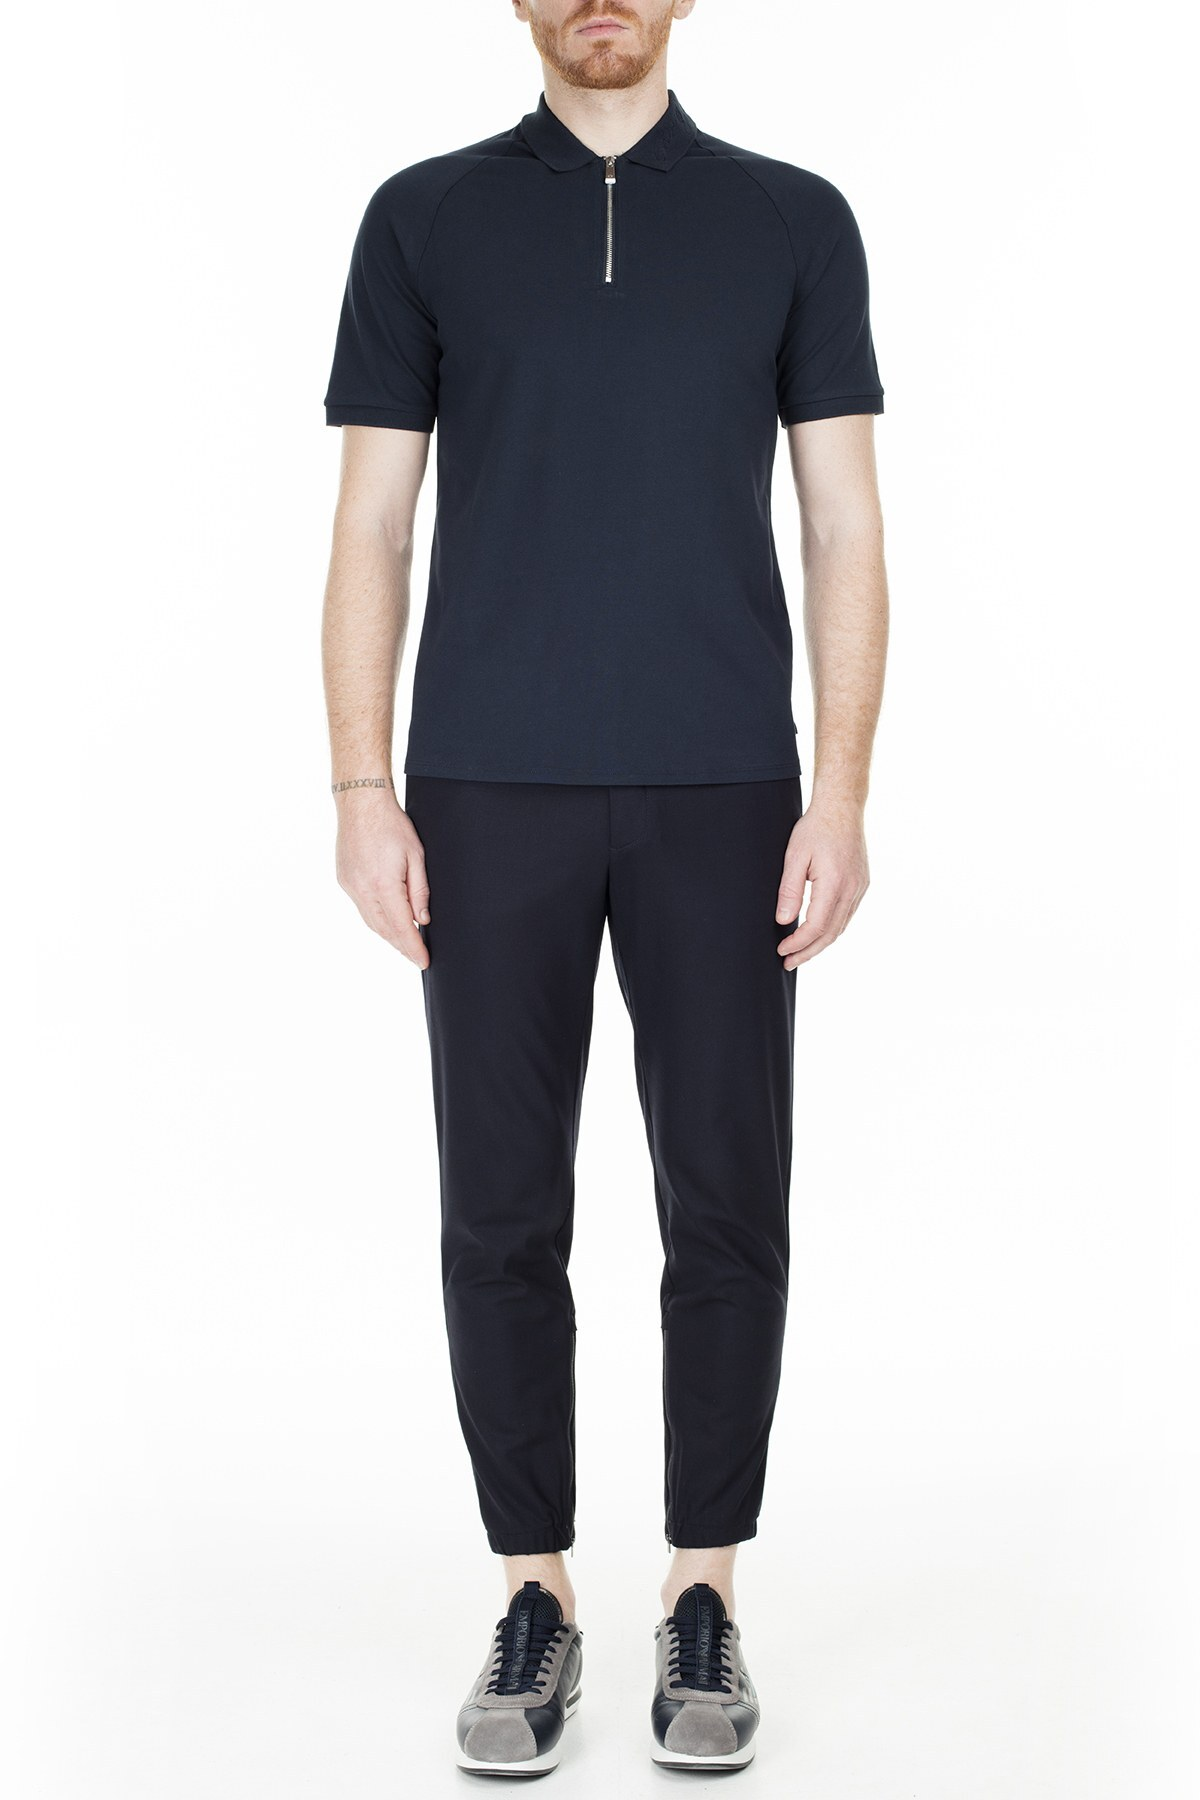 Armani Exchange Regular Fit T Shirt Erkek Polo 3HZFAD ZJ81Z 1510 LACİVERT